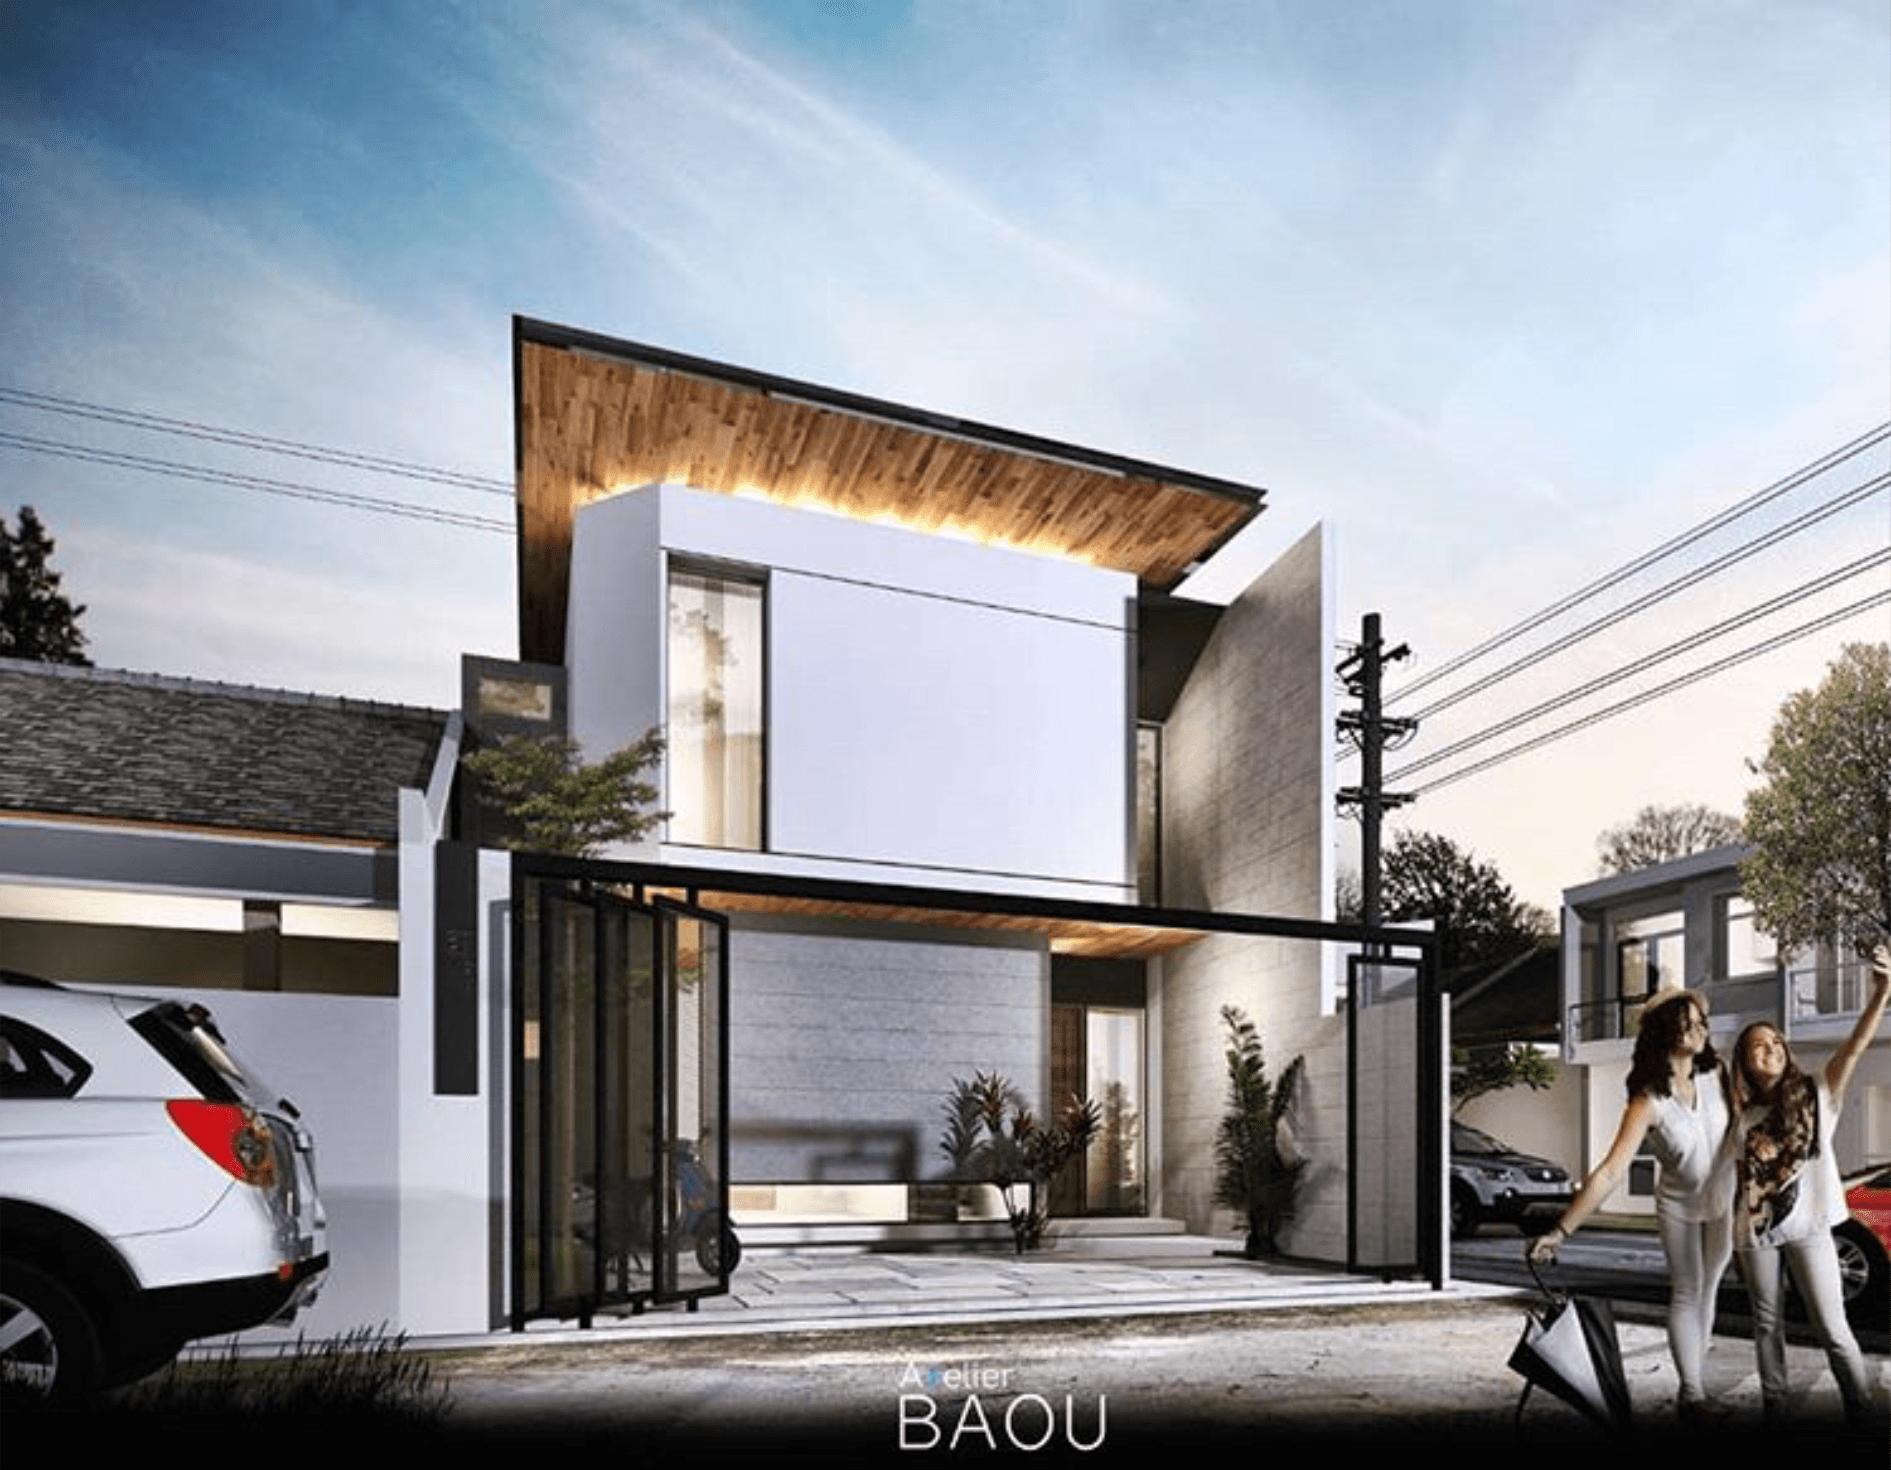 Atelier Baou Ap House Pekanbaru, Kota Pekanbaru, Riau, Indonesia Pekanbaru, Kota Pekanbaru, Riau, Indonesia Atelier-Baou-Ap-House  86493